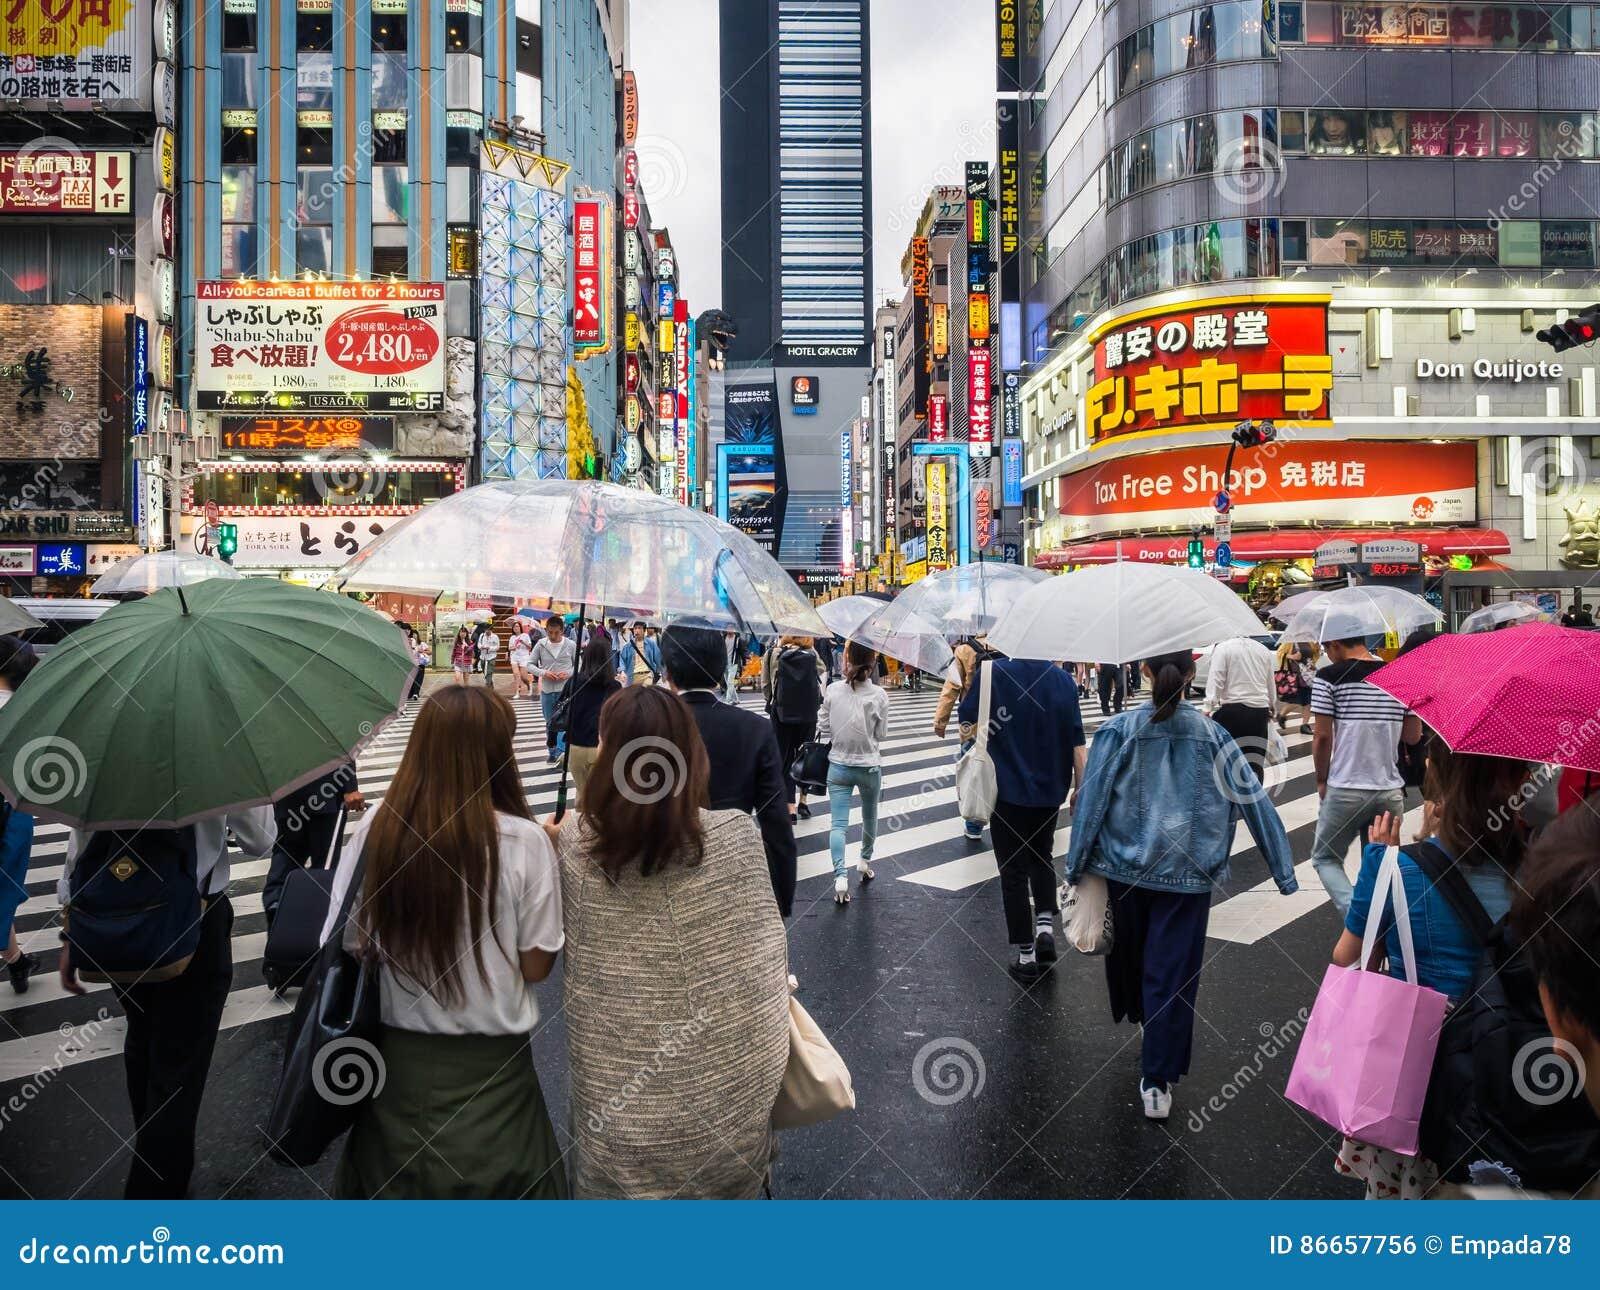 Crowds at Crossing in Japan